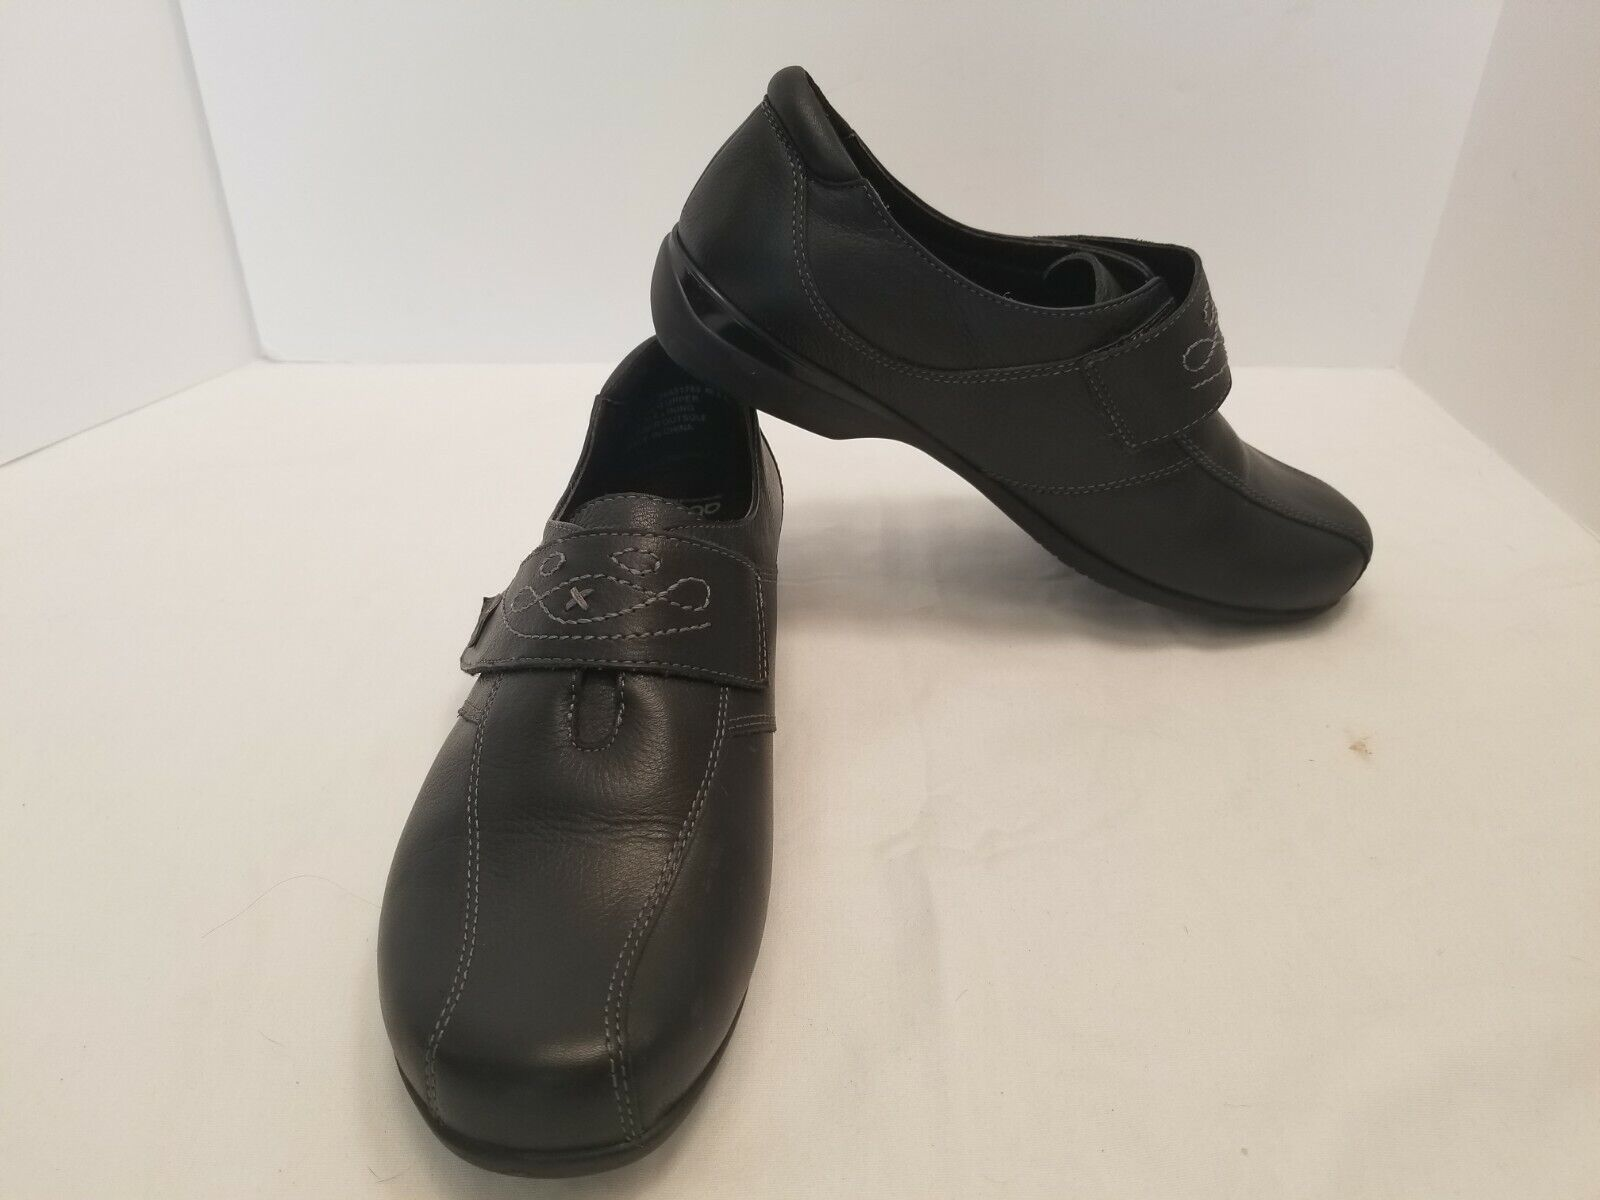 Abeo ASTER Black Orthotics Slip On Loafers Women's Comfort Shoes Size 8.5 EUC